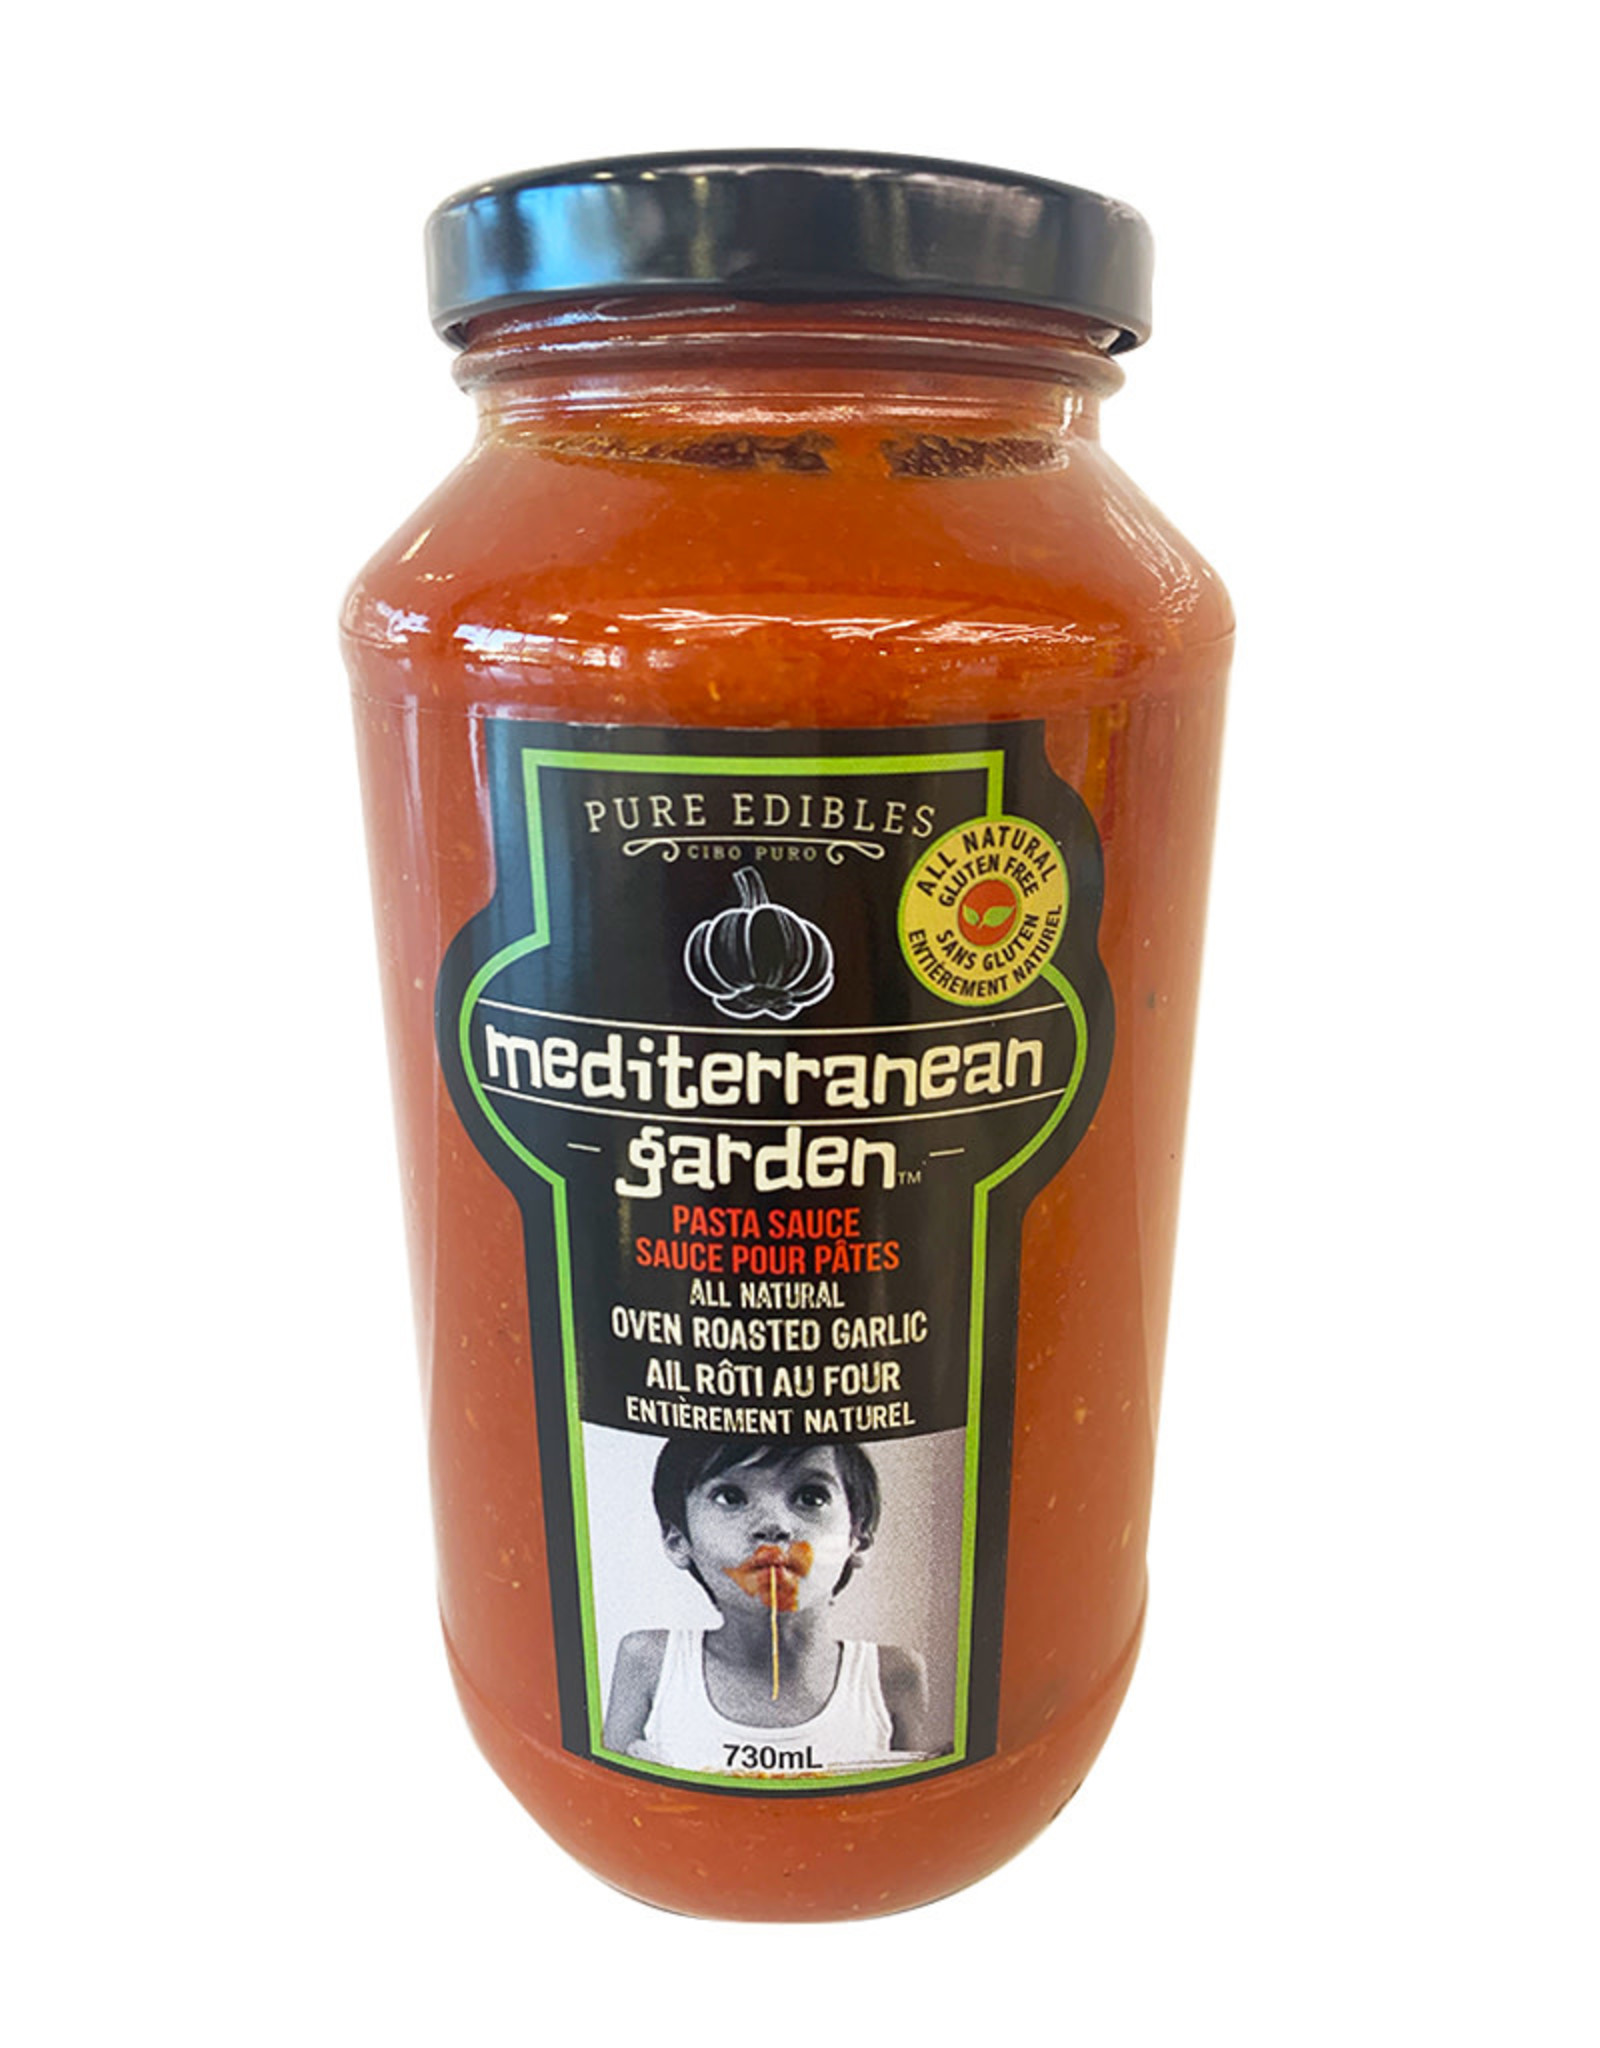 Mediterranean Garden Mediterranean Garden - Pasta Sauce, Roasted Garlic (730ml)